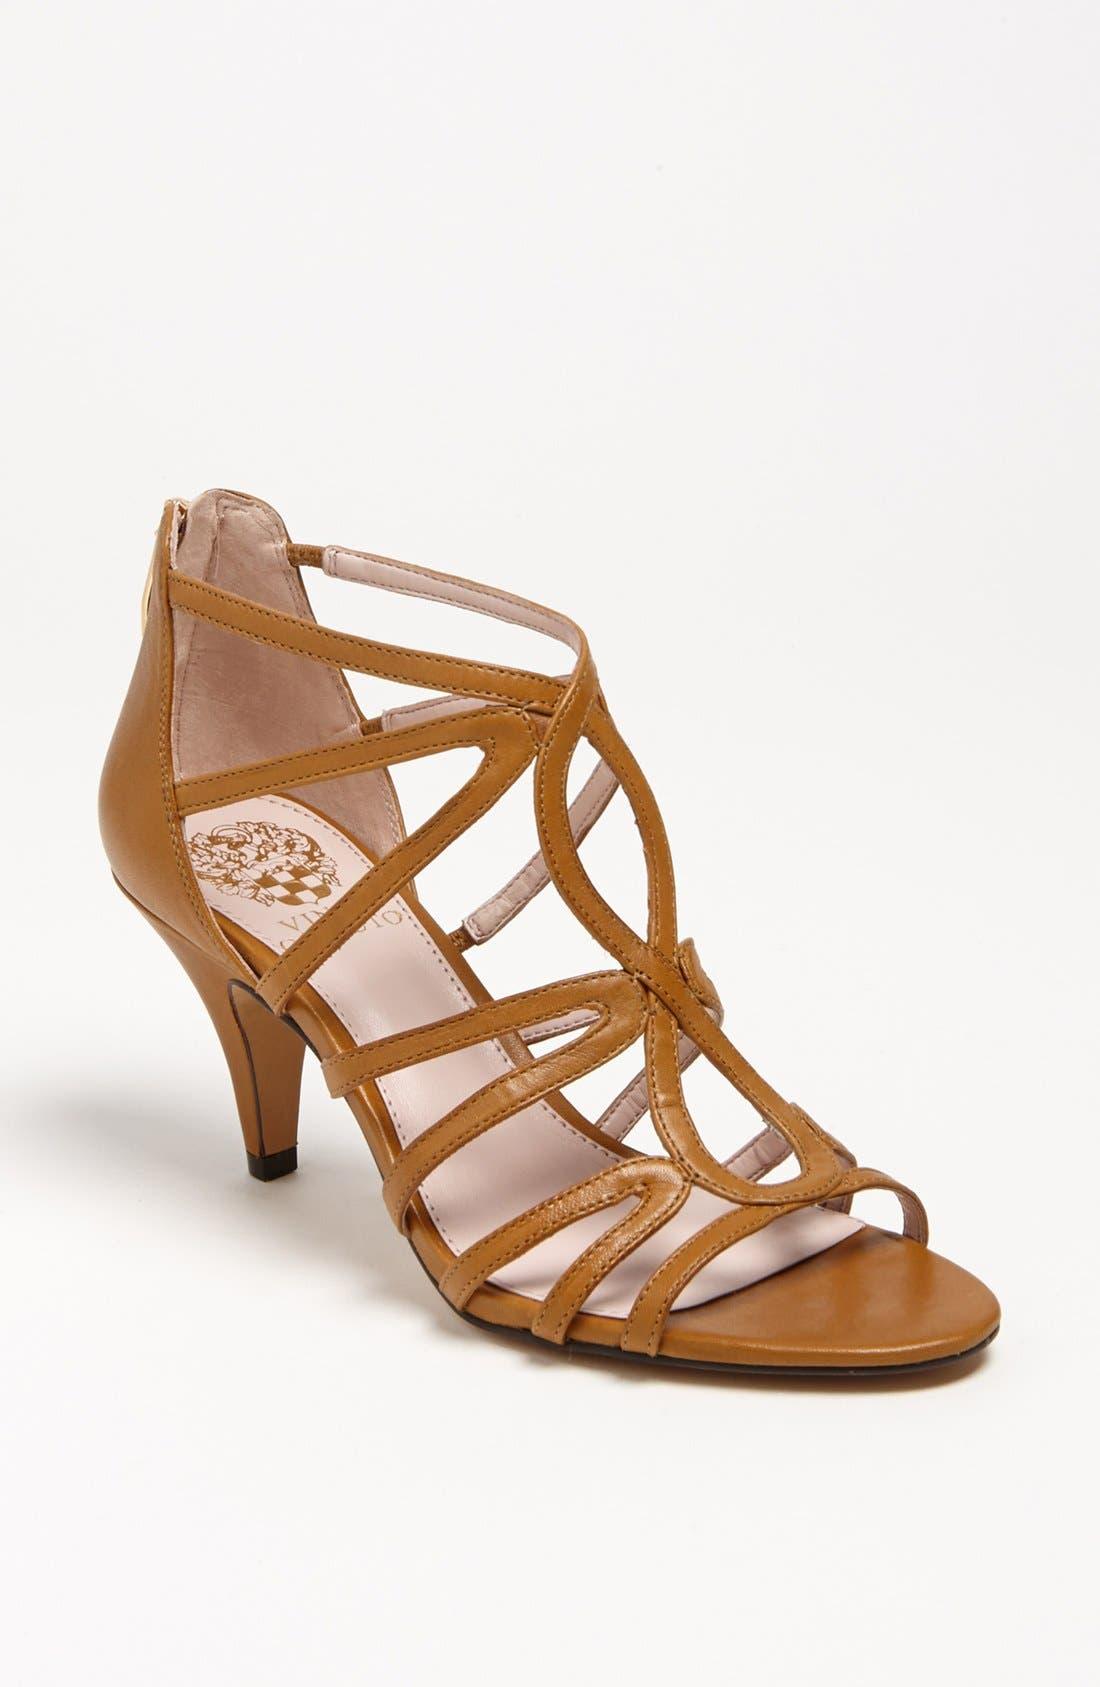 Main Image - Vince Camuto 'Massi' Sandal